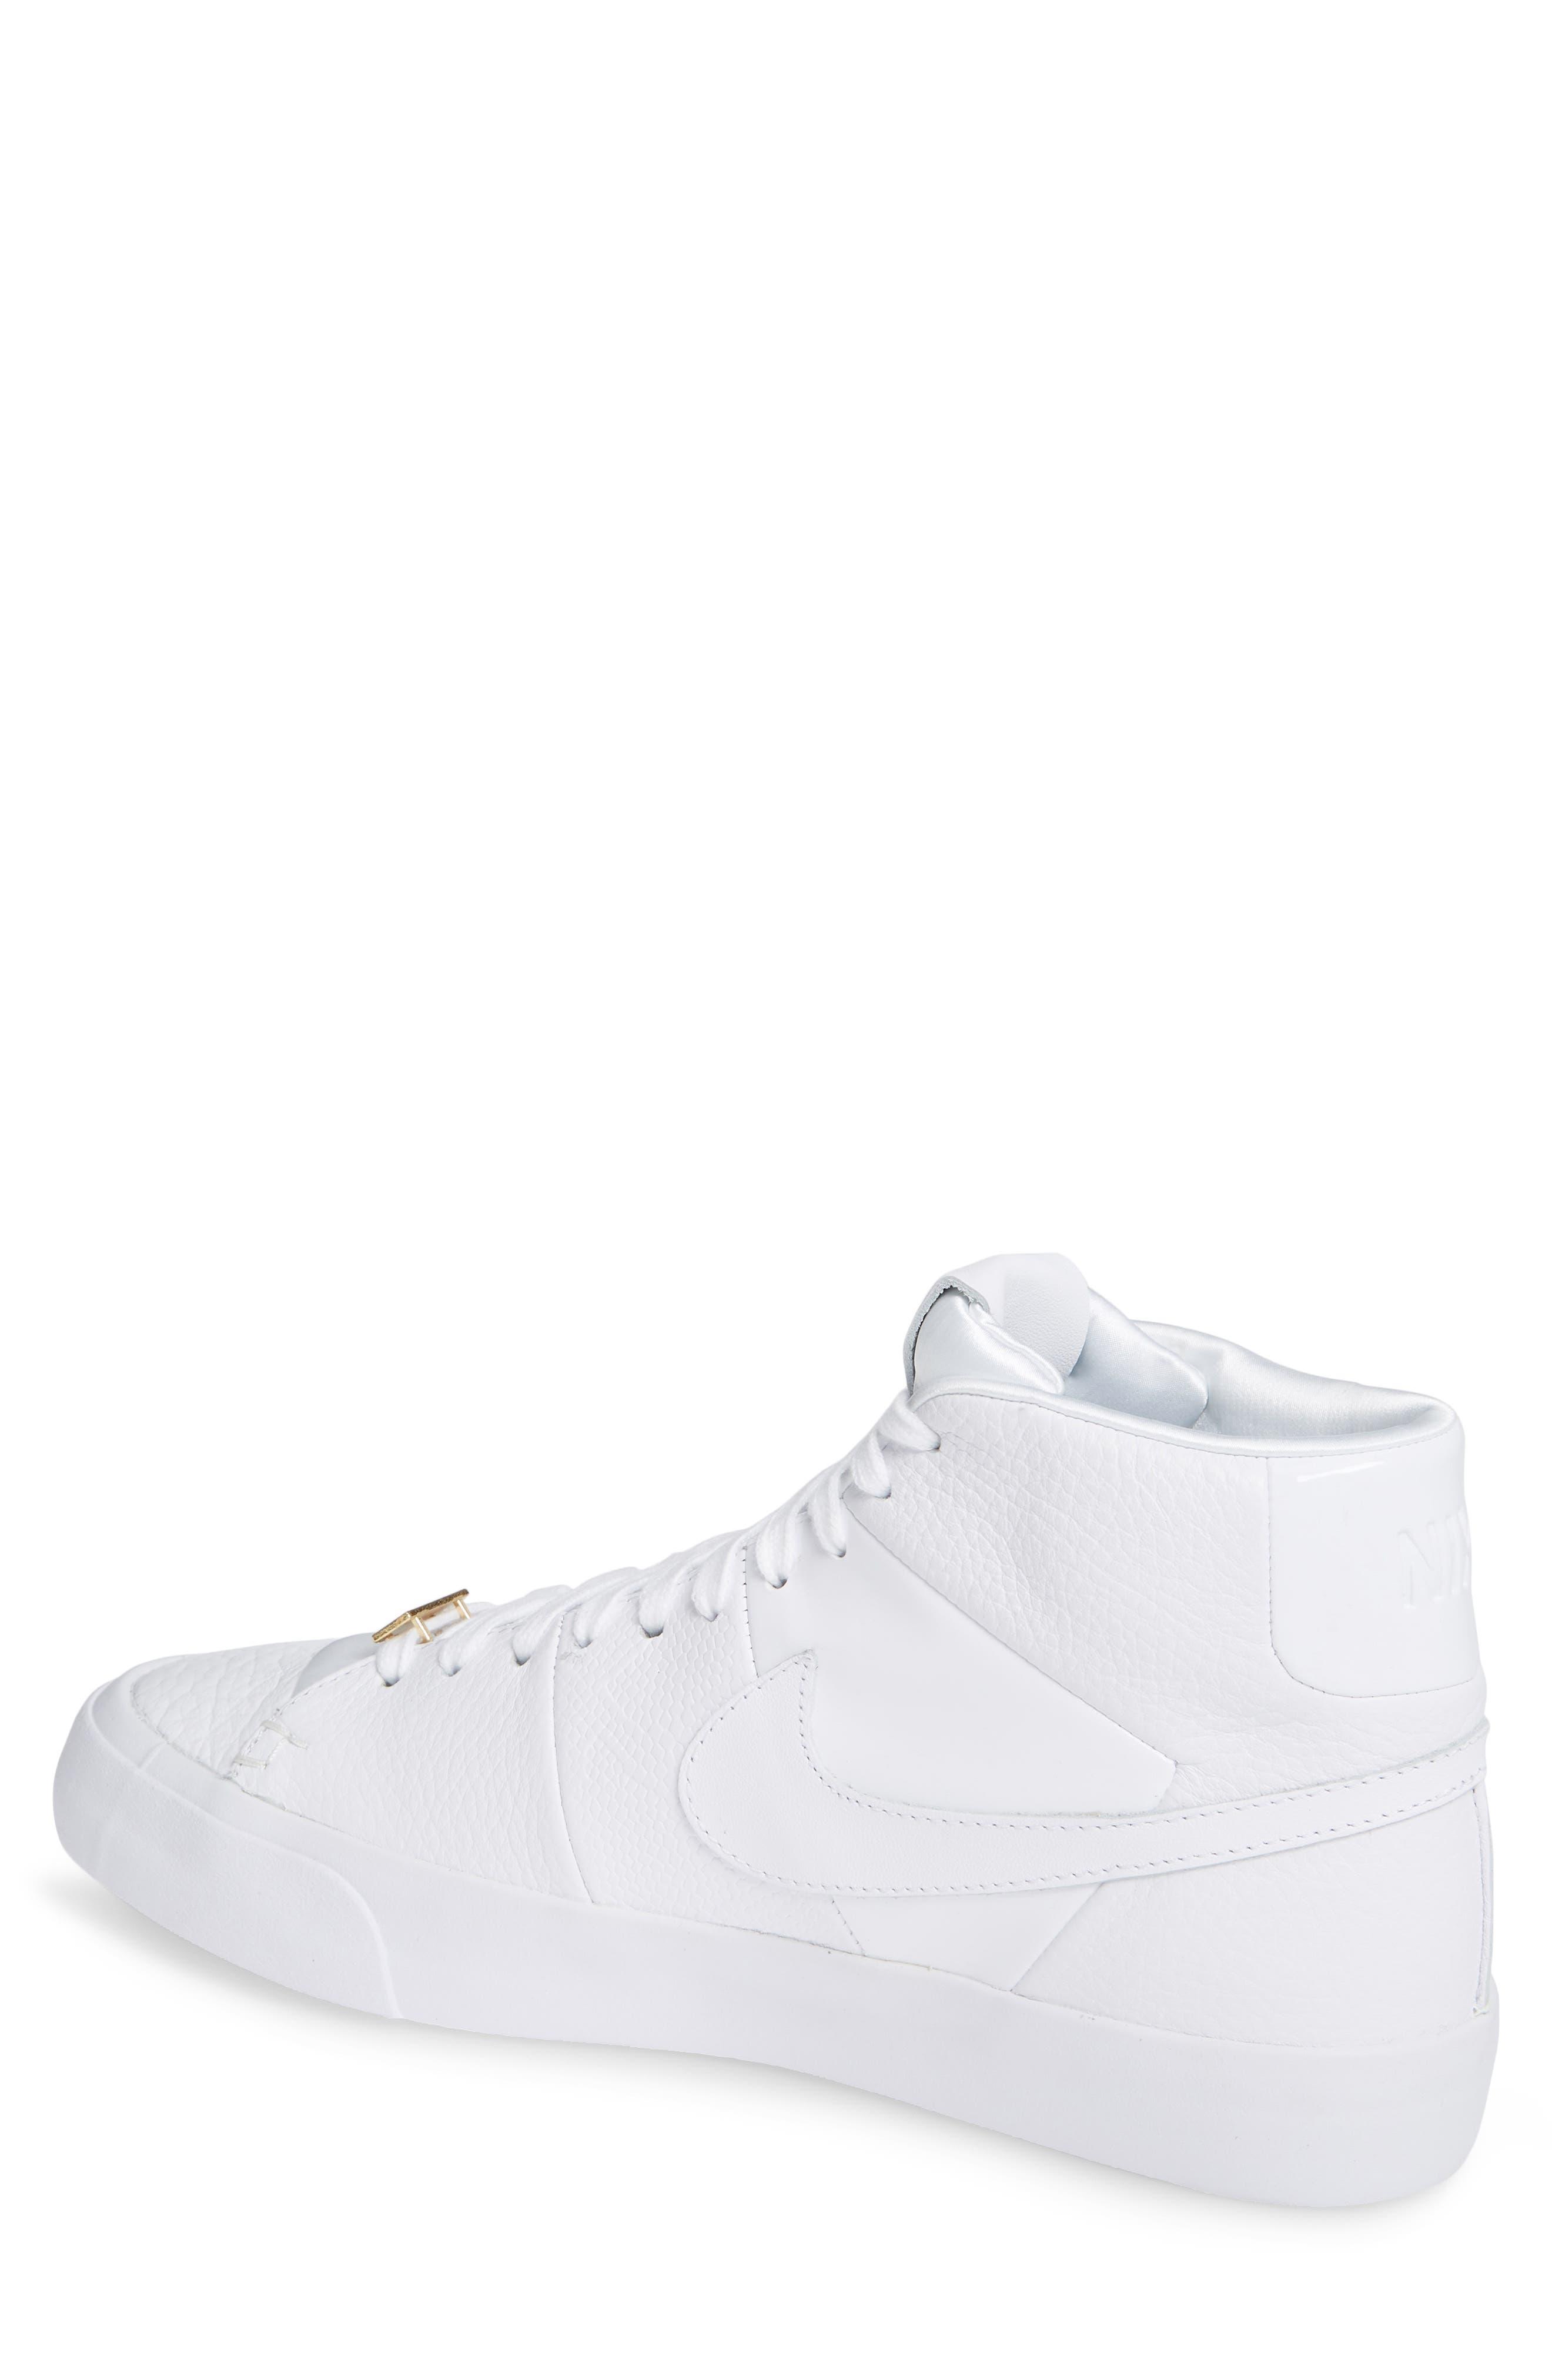 Blazer Royal QS High Top Sneaker,                             Alternate thumbnail 2, color,                             WHITE/ WHITE/ WHITE